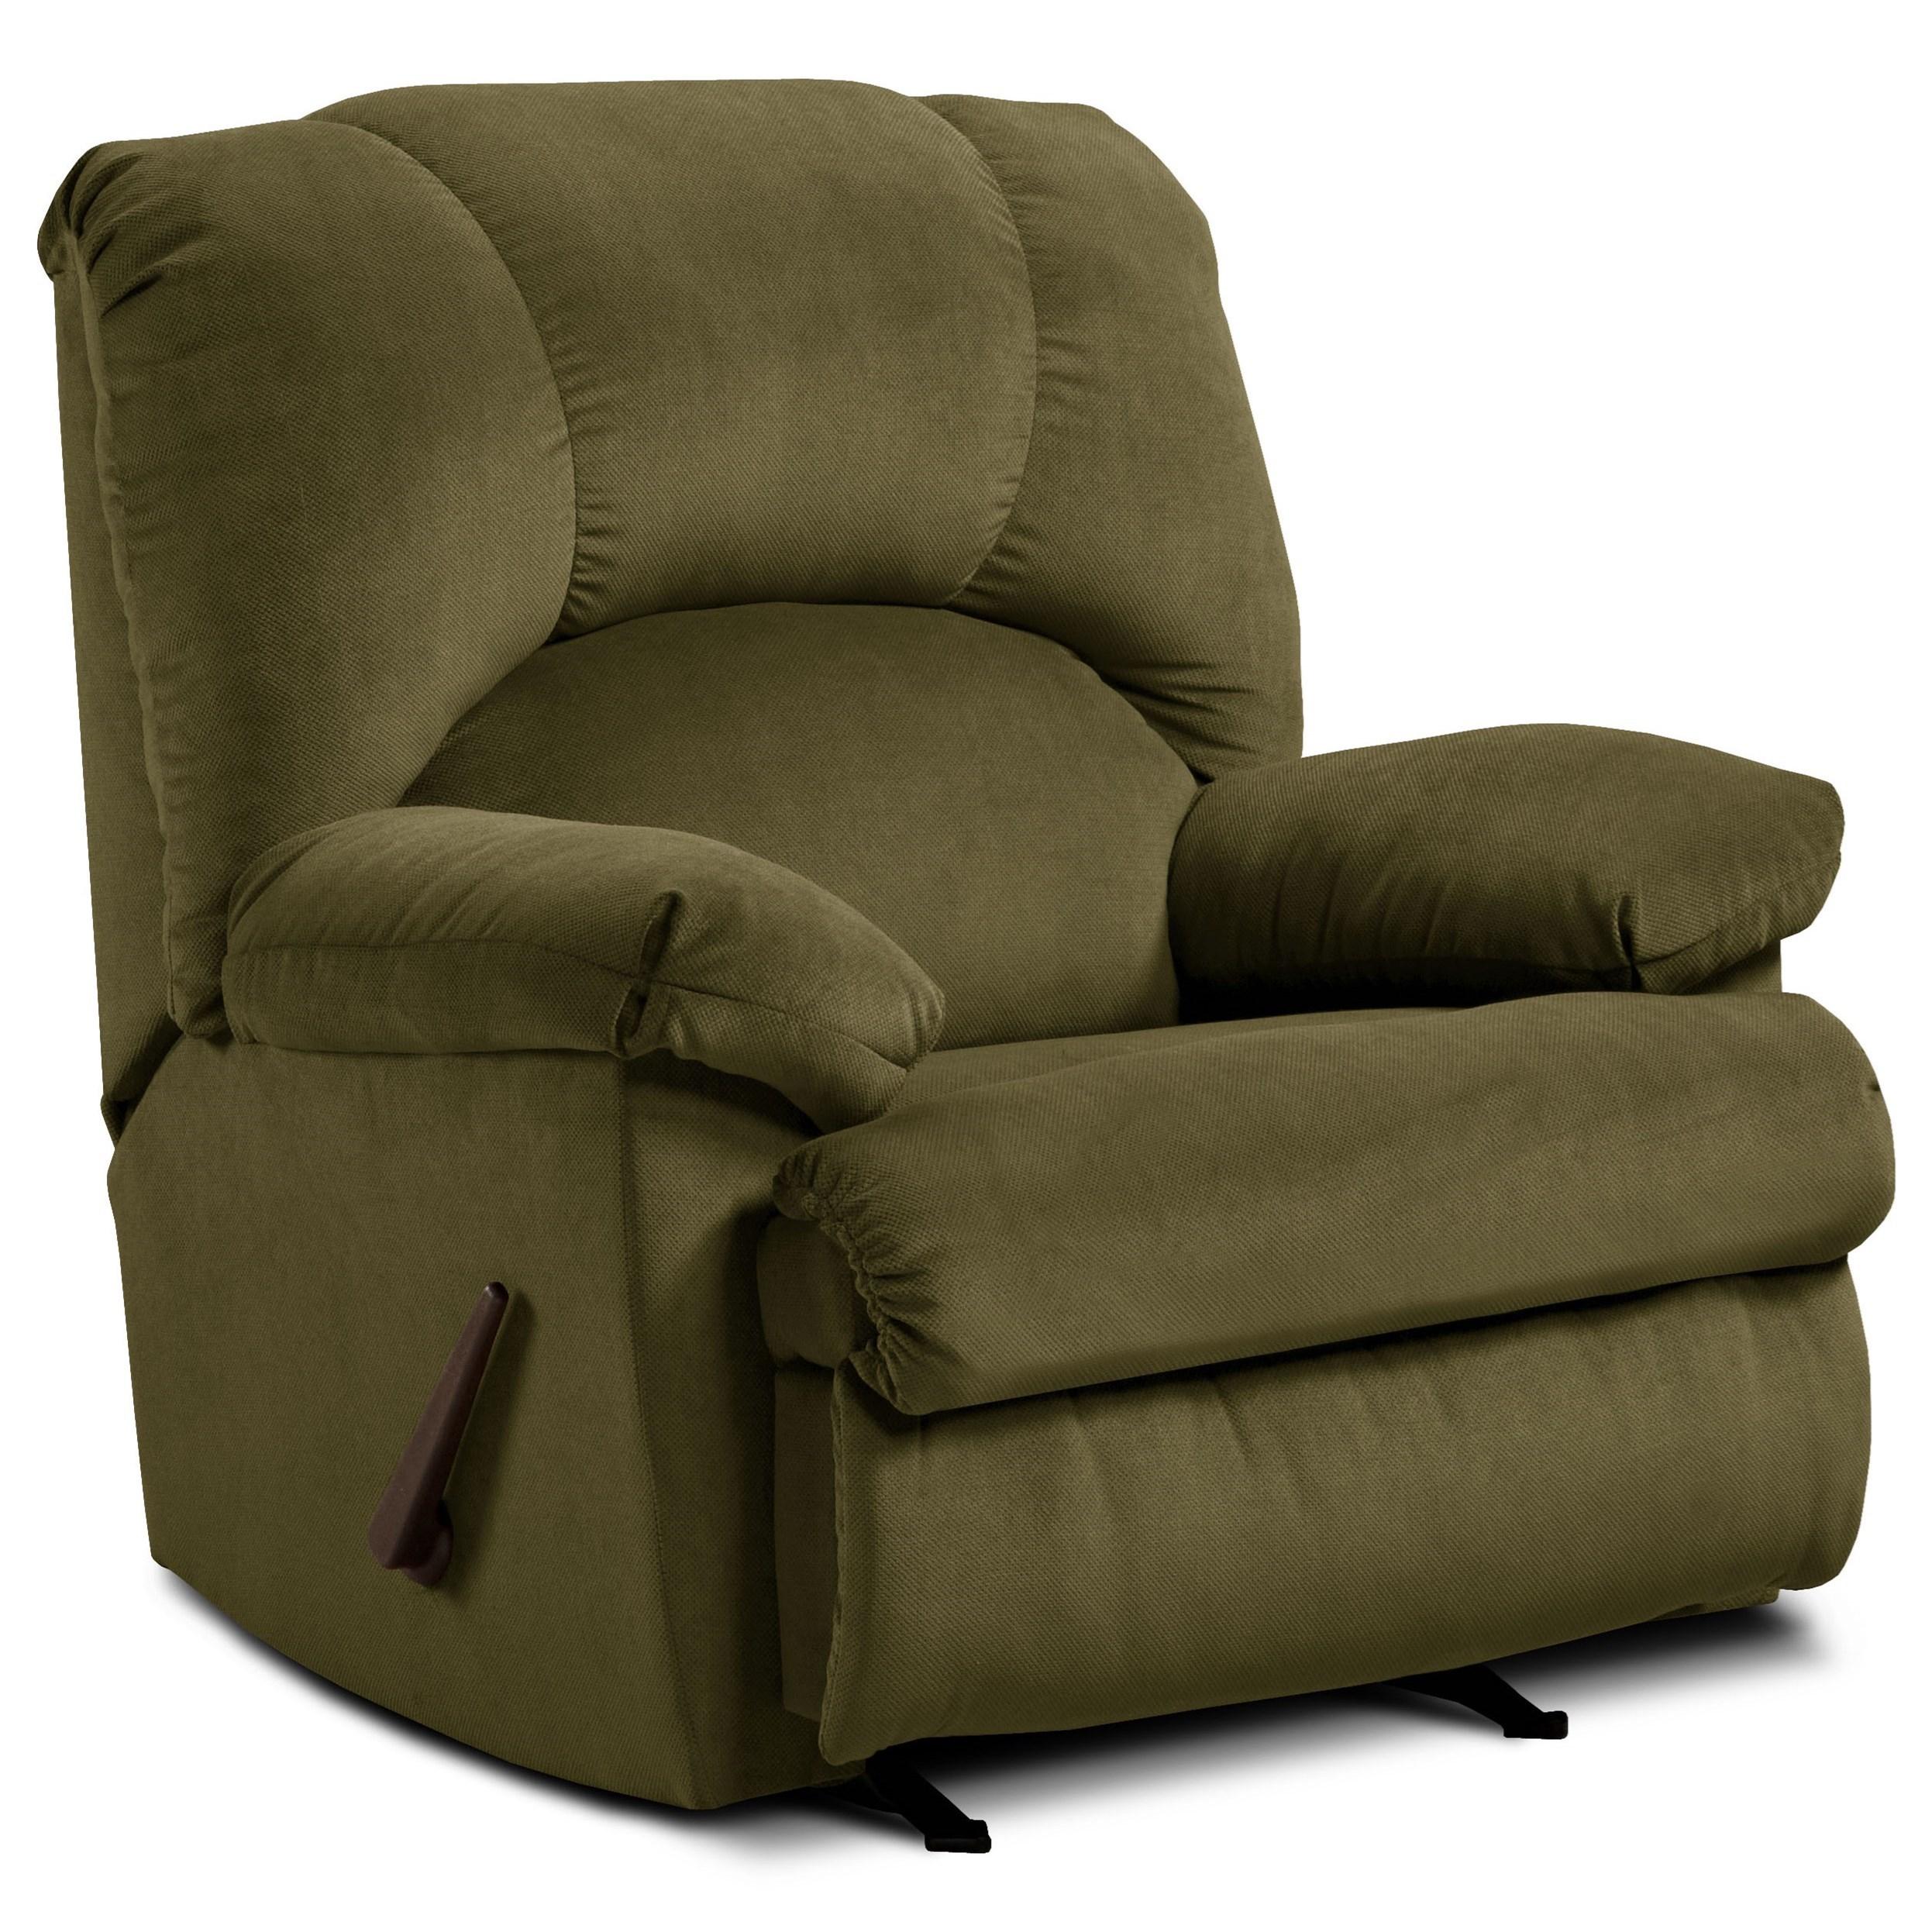 8500  Recliner by Washington Furniture at Lynn's Furniture & Mattress